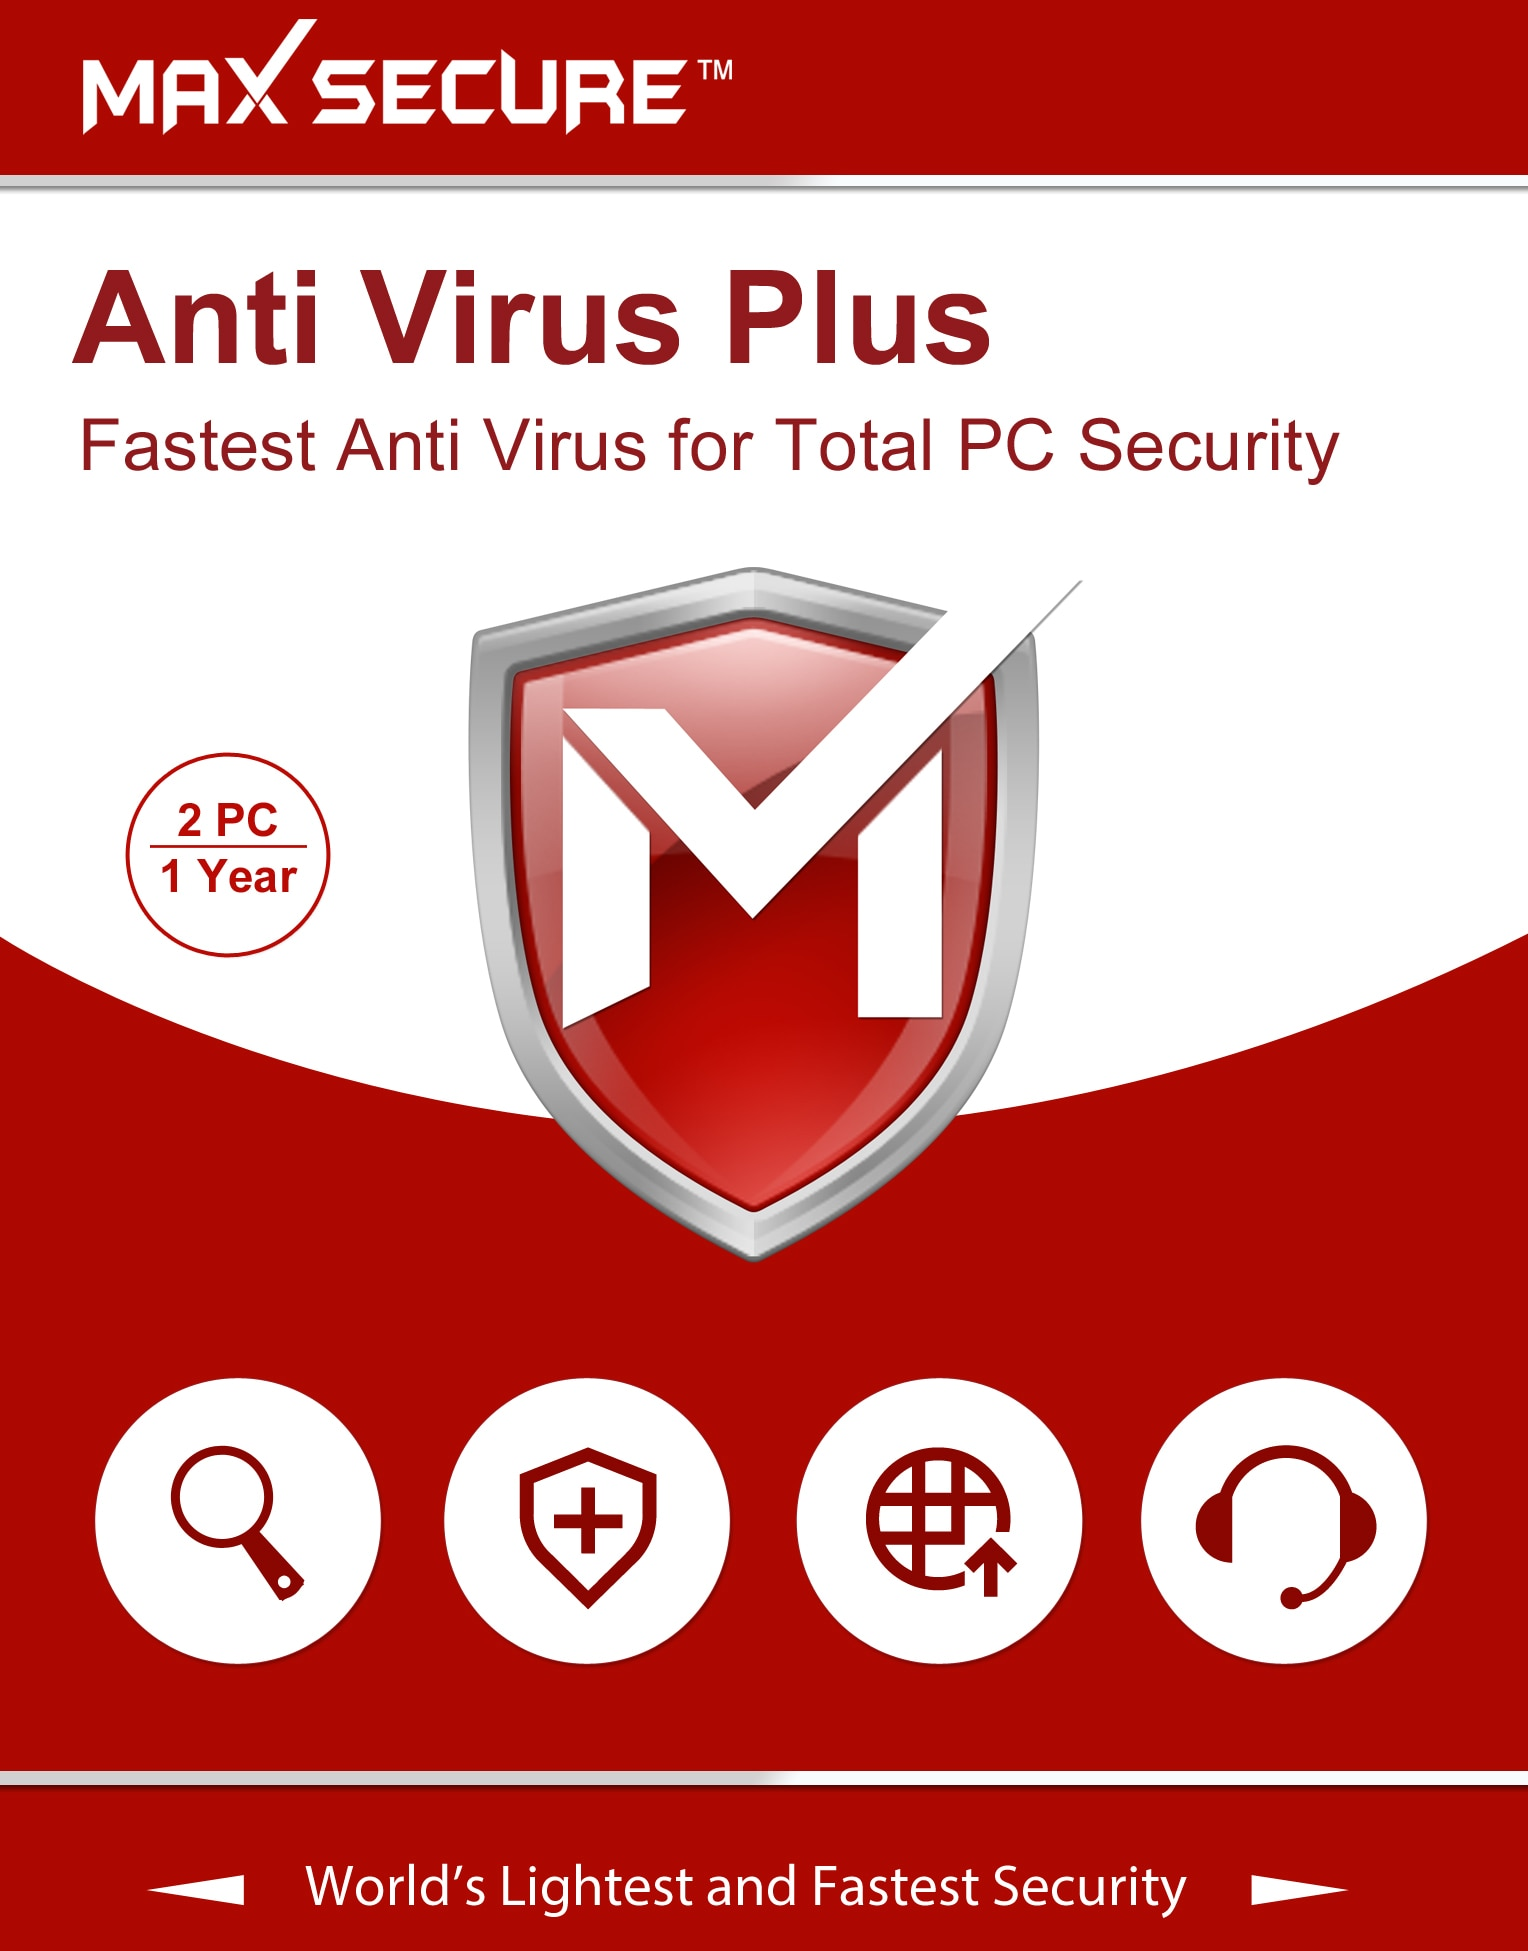 Max Secure Anti Virus 2 Pc 1 Year